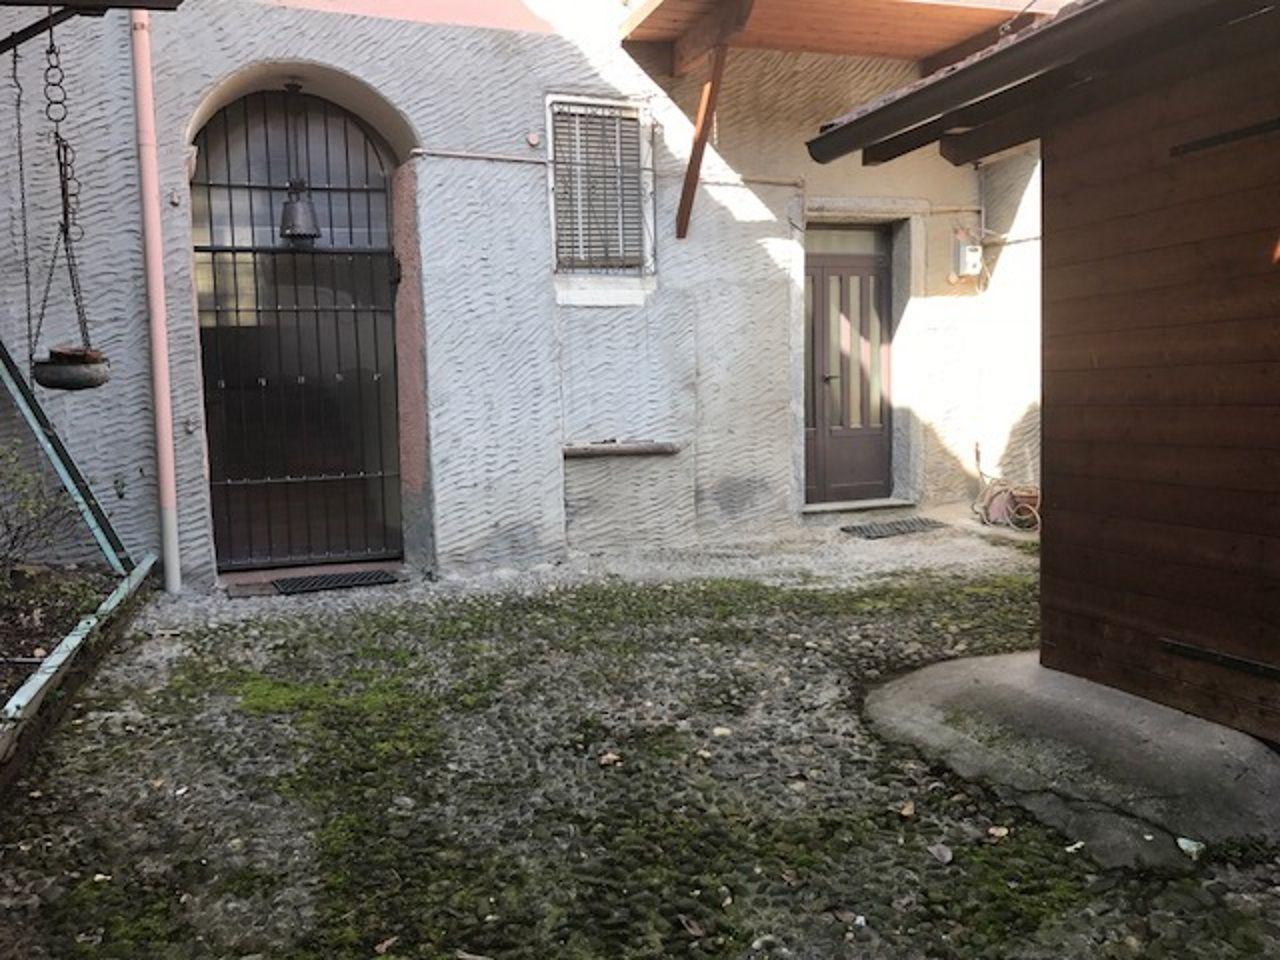 Verbania suna casa 100mq 3 camere con giardino e garage for Giardino 100 mq